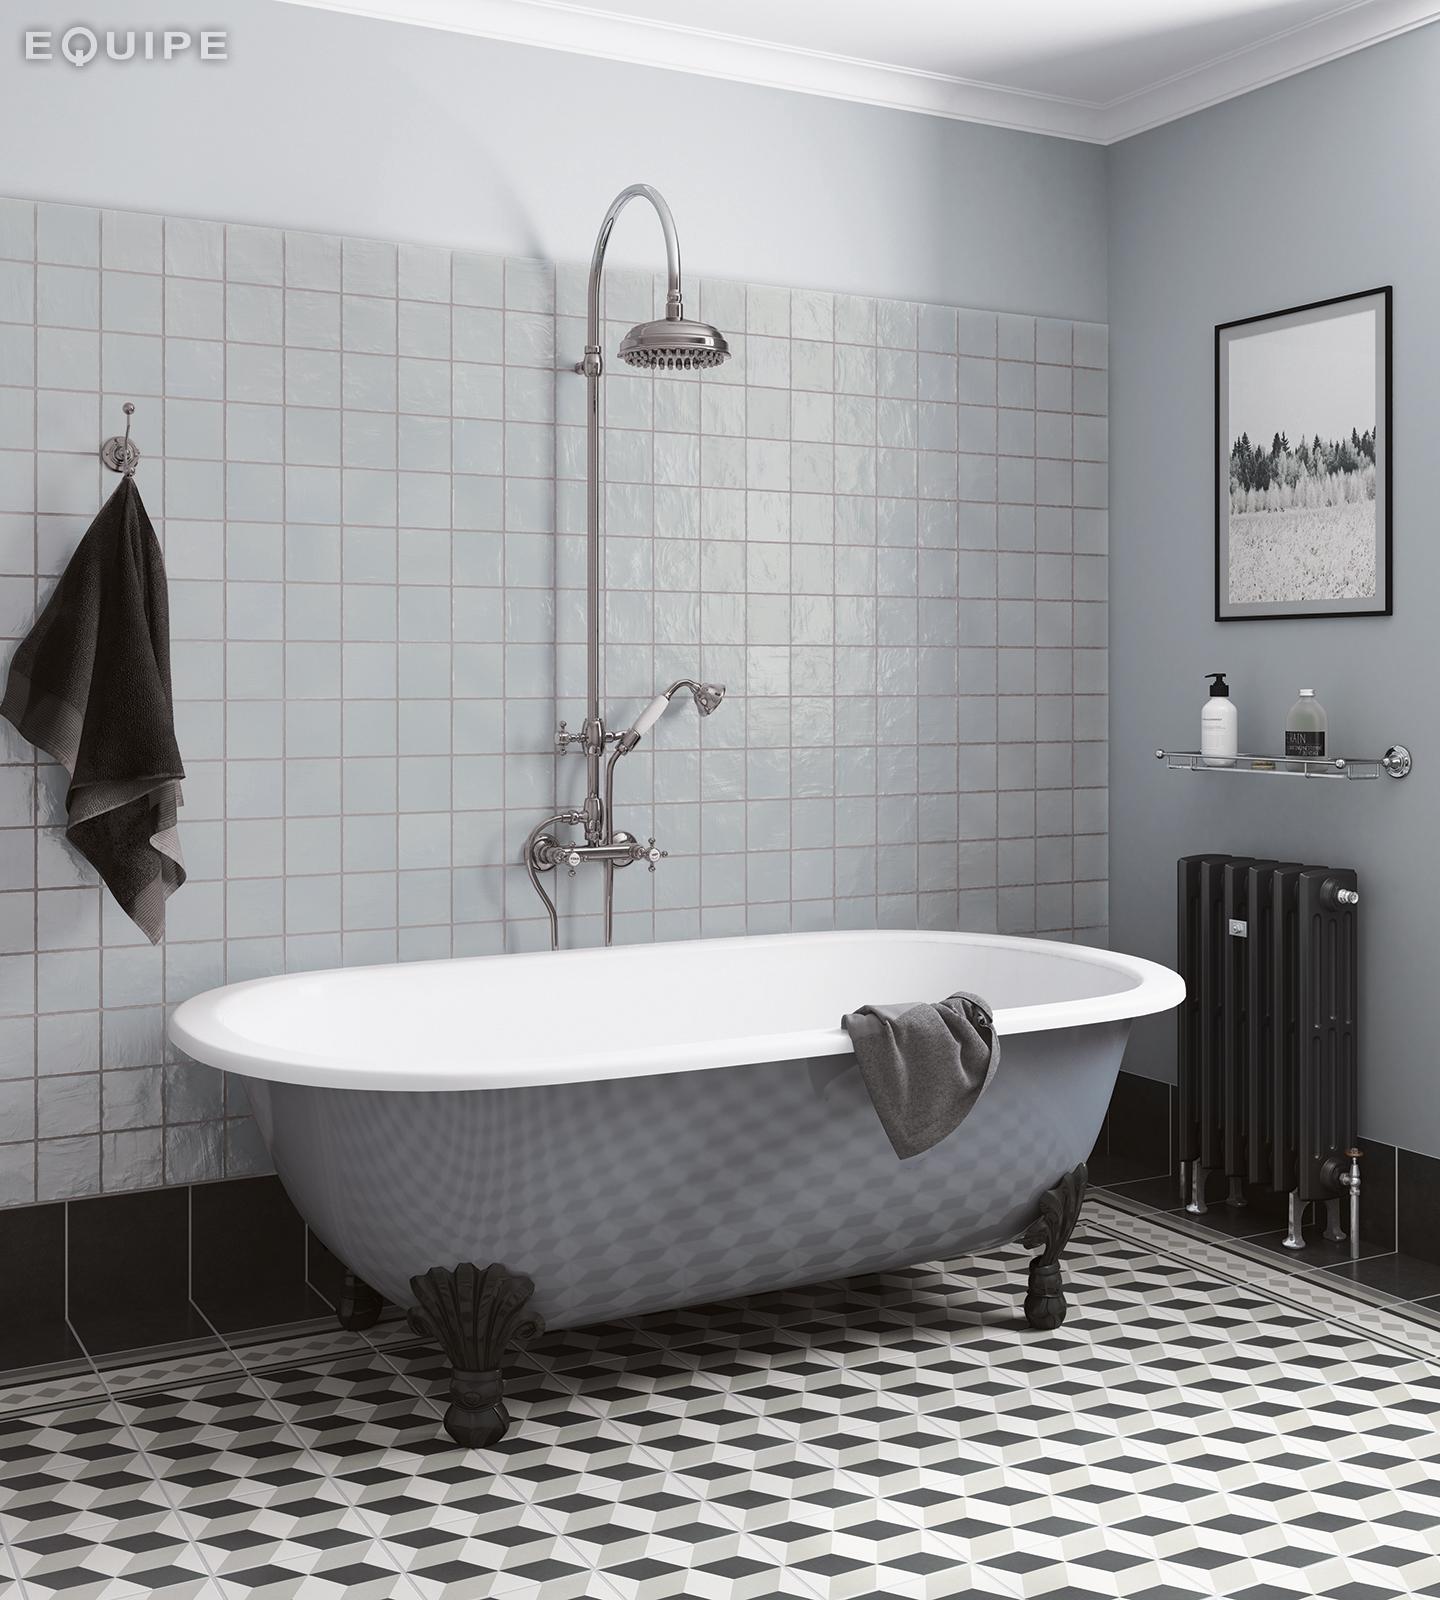 Mallorca 100x100 blue bathroom